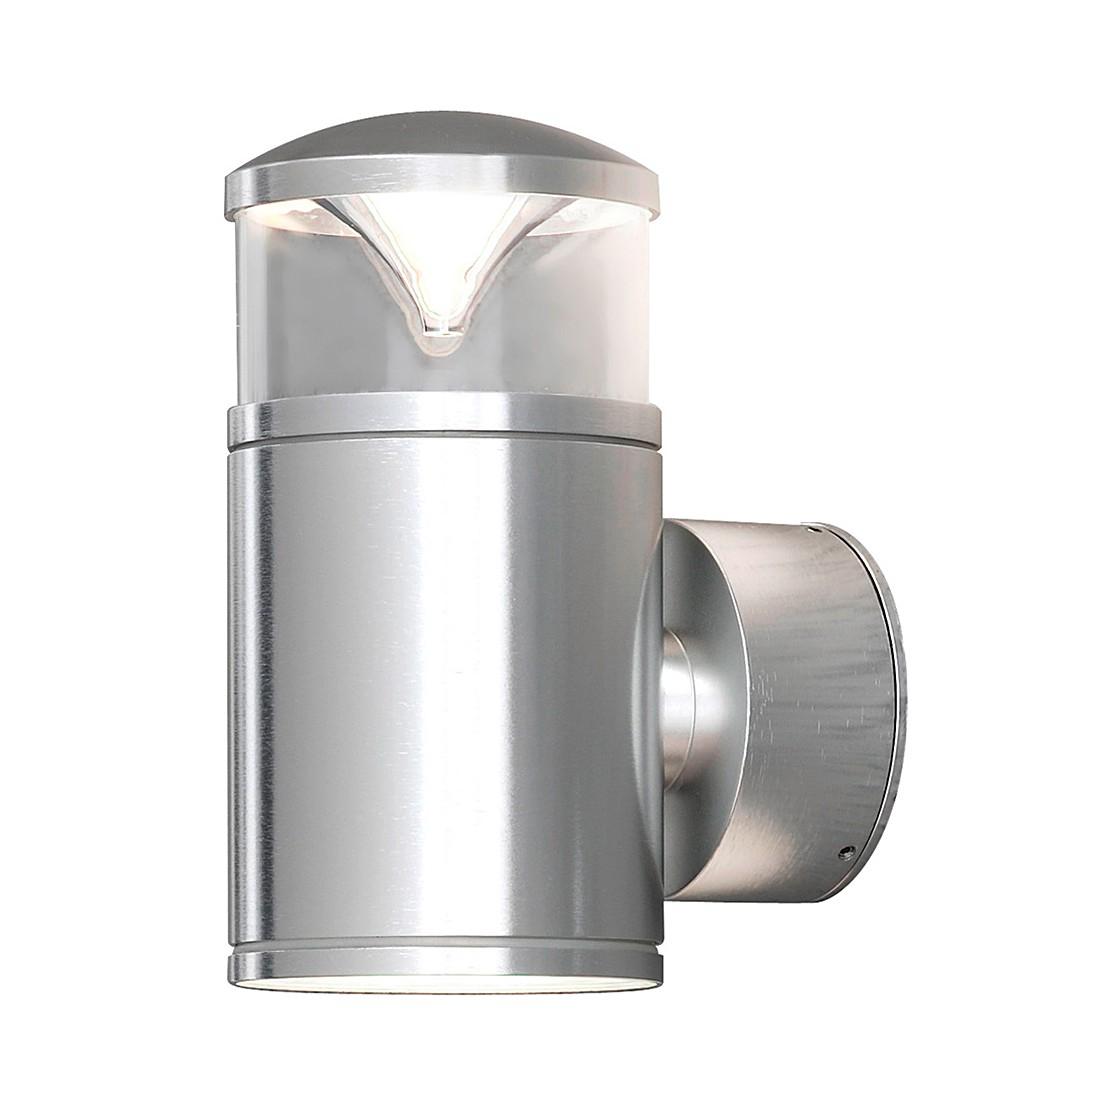 Wandleuchte Monza Up & Down ● Aluminium/Glas ● 2-flammig- Konstsmide A++